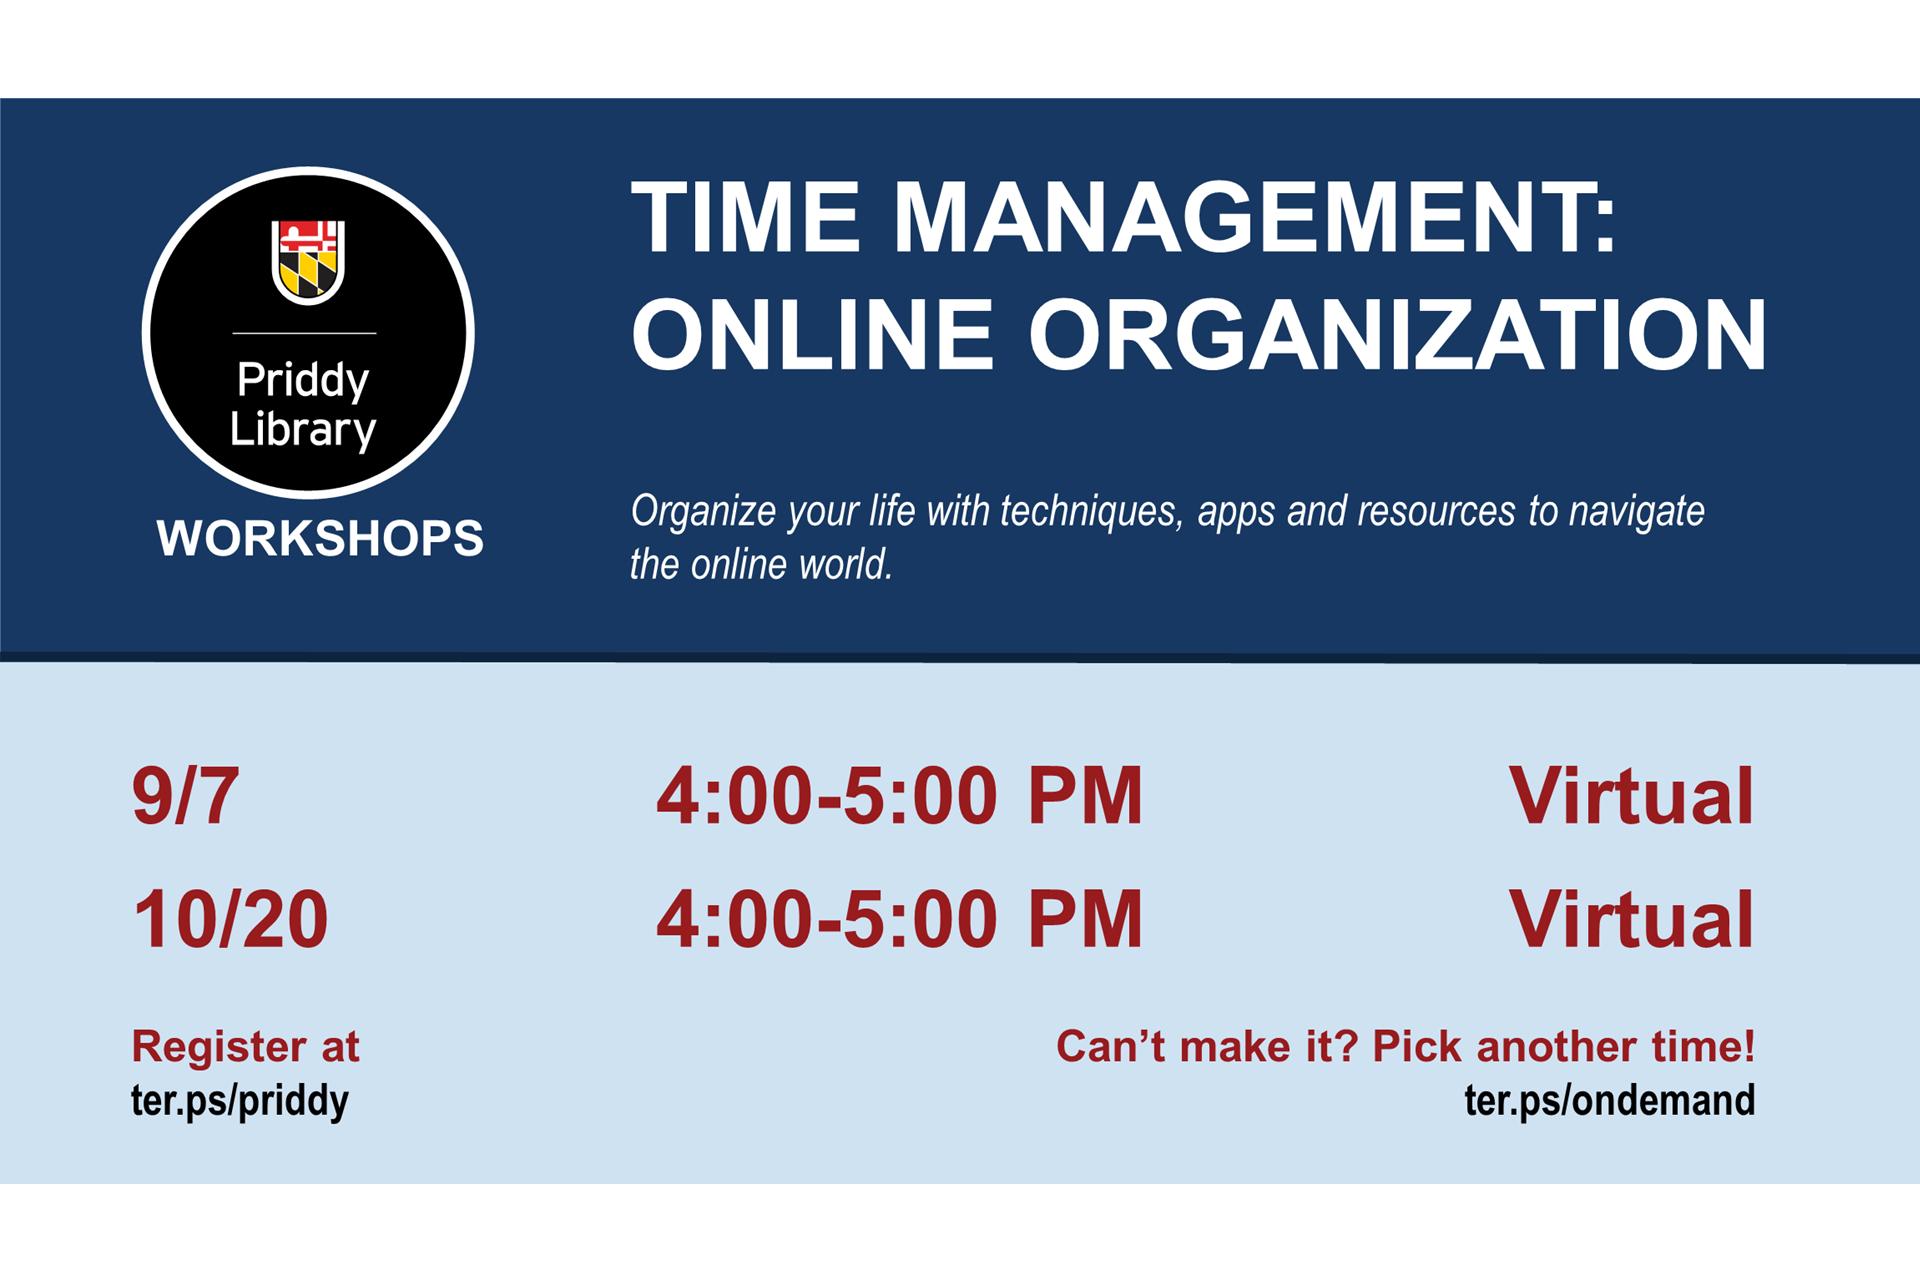 Time Management: Online Organization